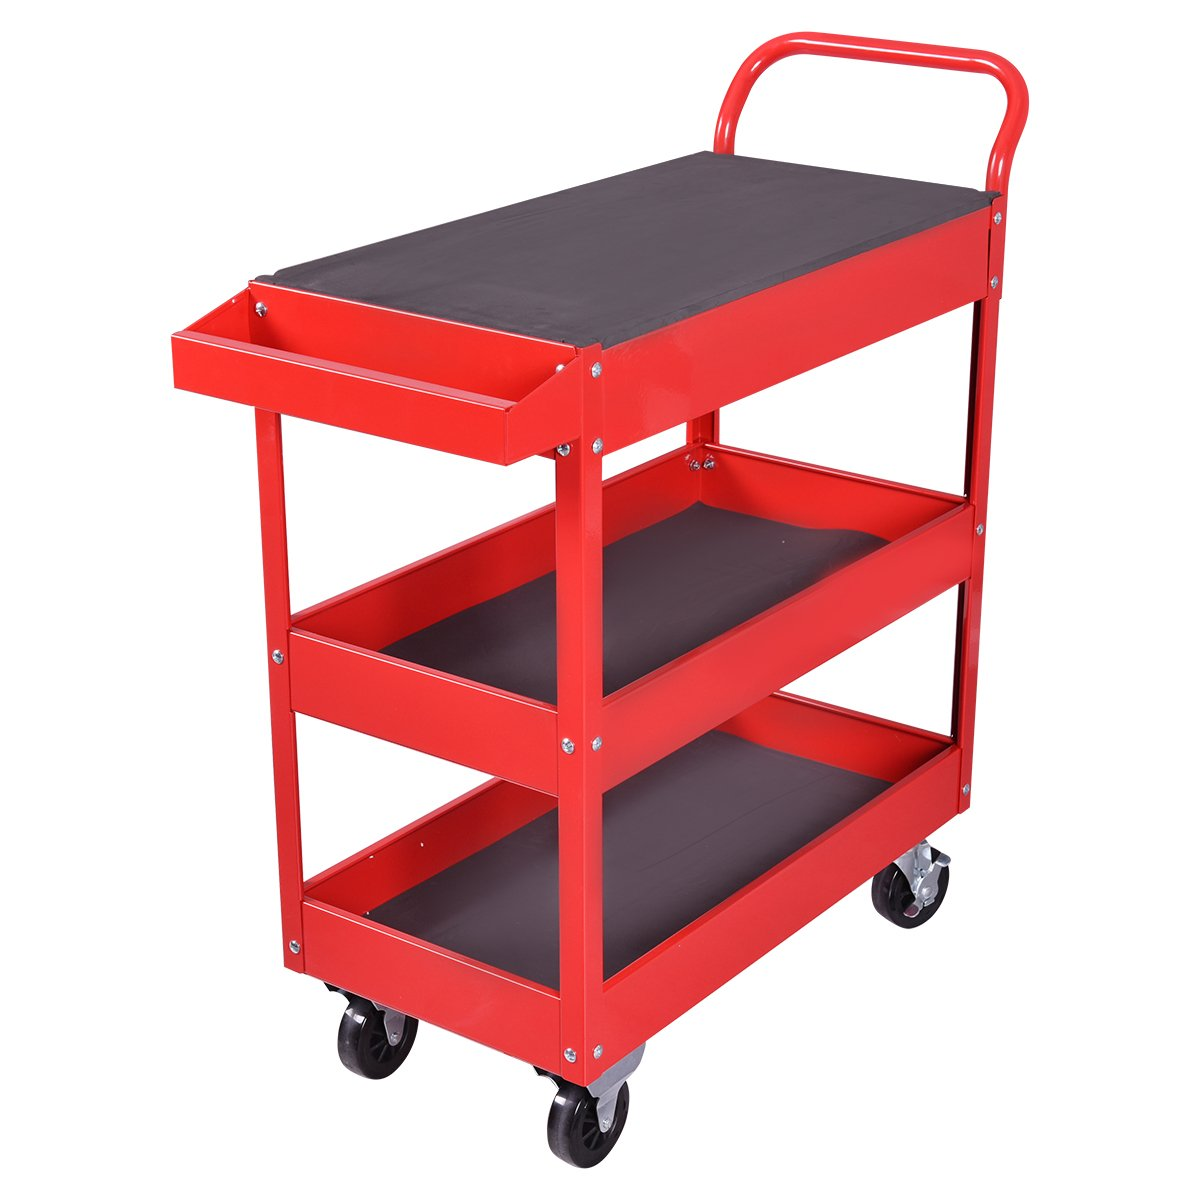 Goplus Tool Cart Rolling 36-Inch Steel Tool Chest Box Wheels Trays w/ Locking Drawer, Red by Goplus (Image #4)